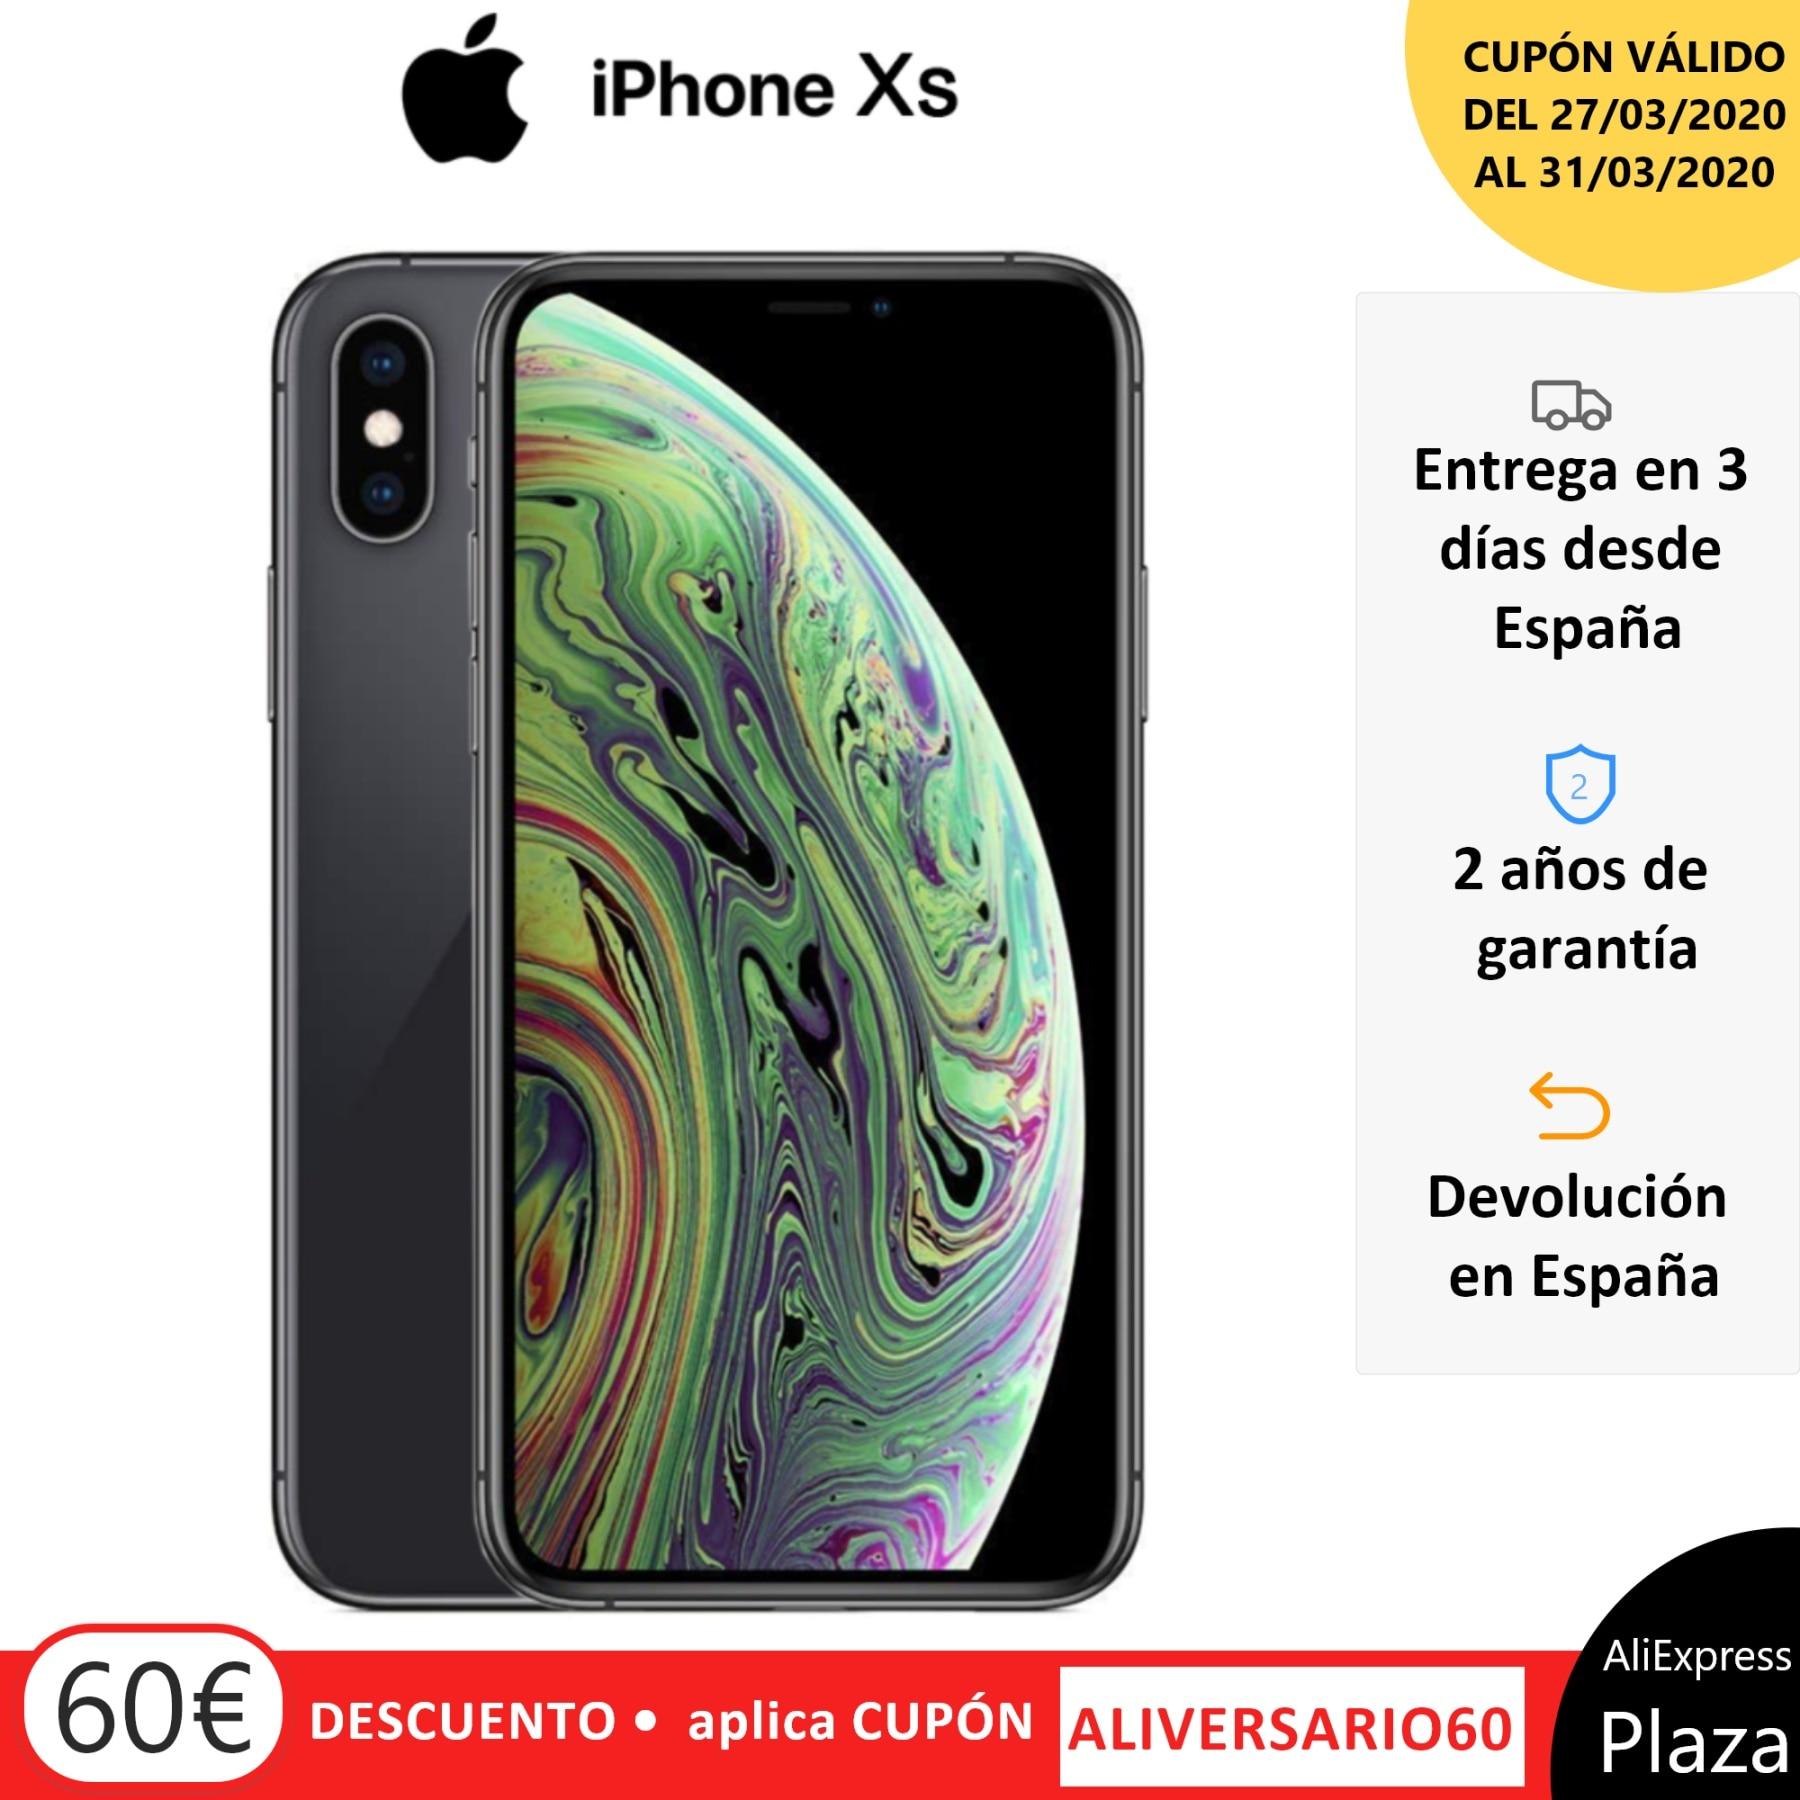 Apple IPhone Xs, Color Grey (Greys), EU Version. Band 4G/LTE/Wi-Fi, 6 Internal 4GB De Memoria, 4GB Ram, Screen